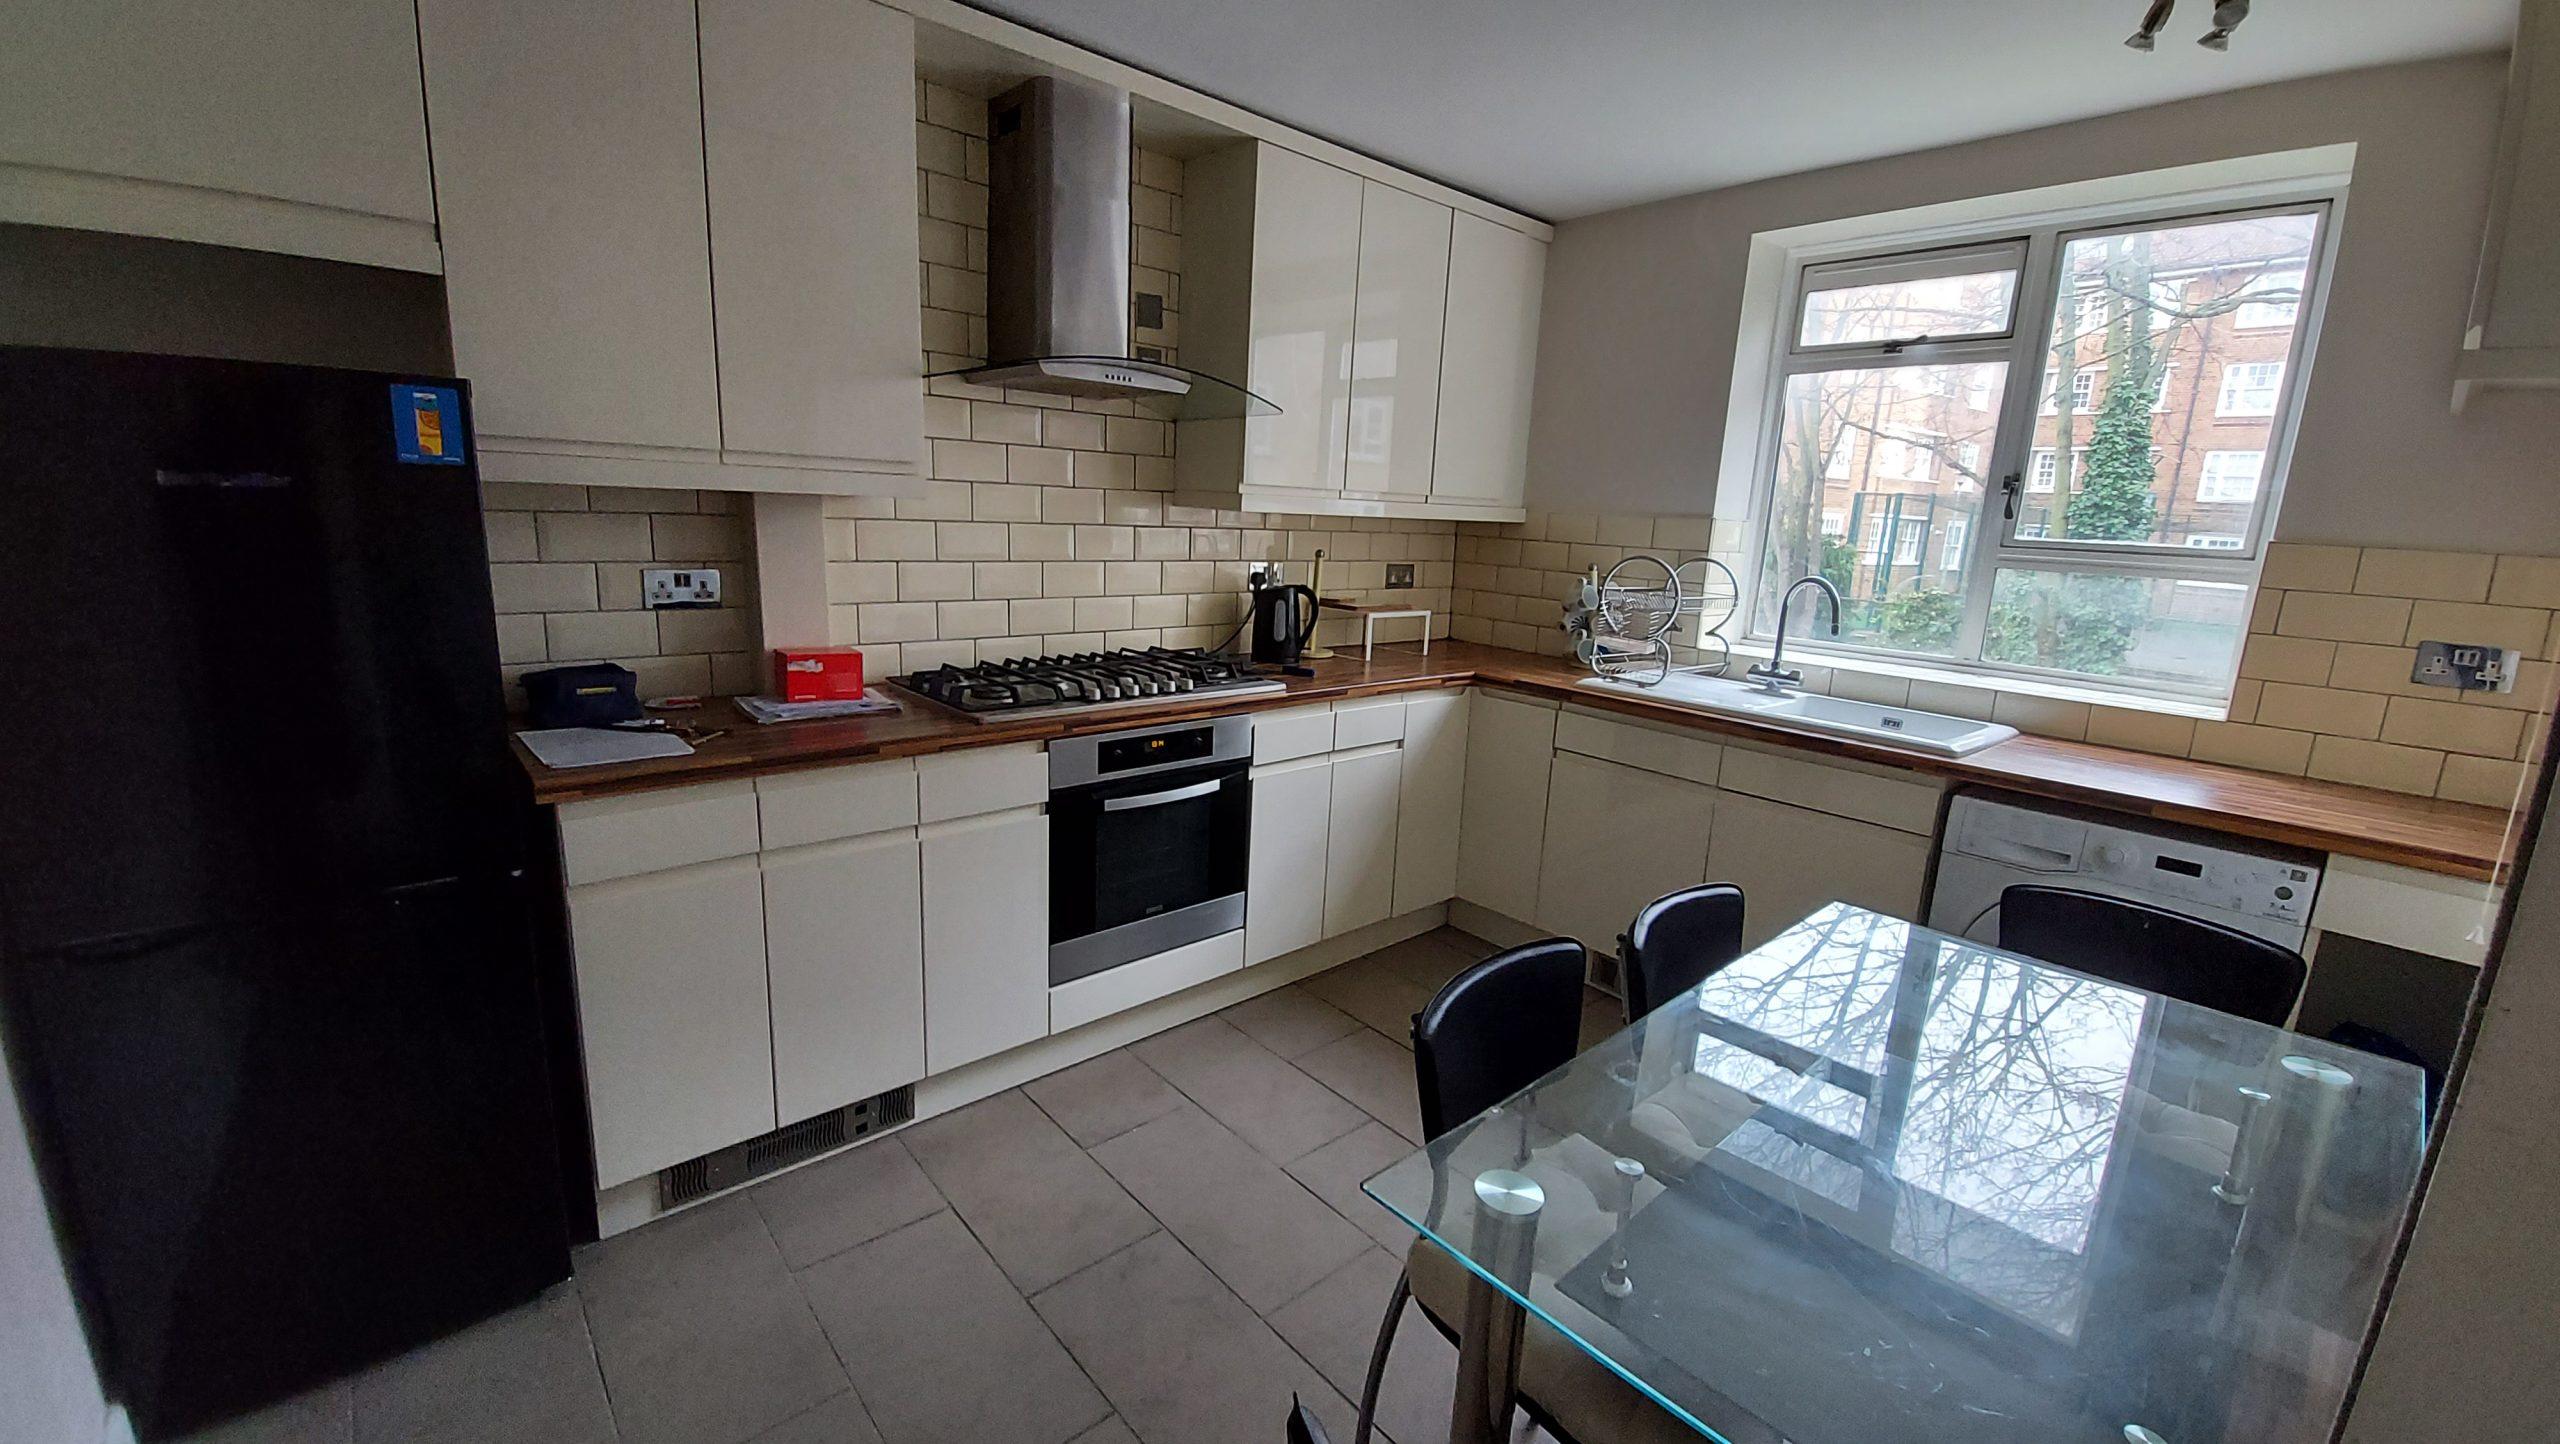 3 Bedroom Flat Goodrich House Amhurst Park N16 5AW